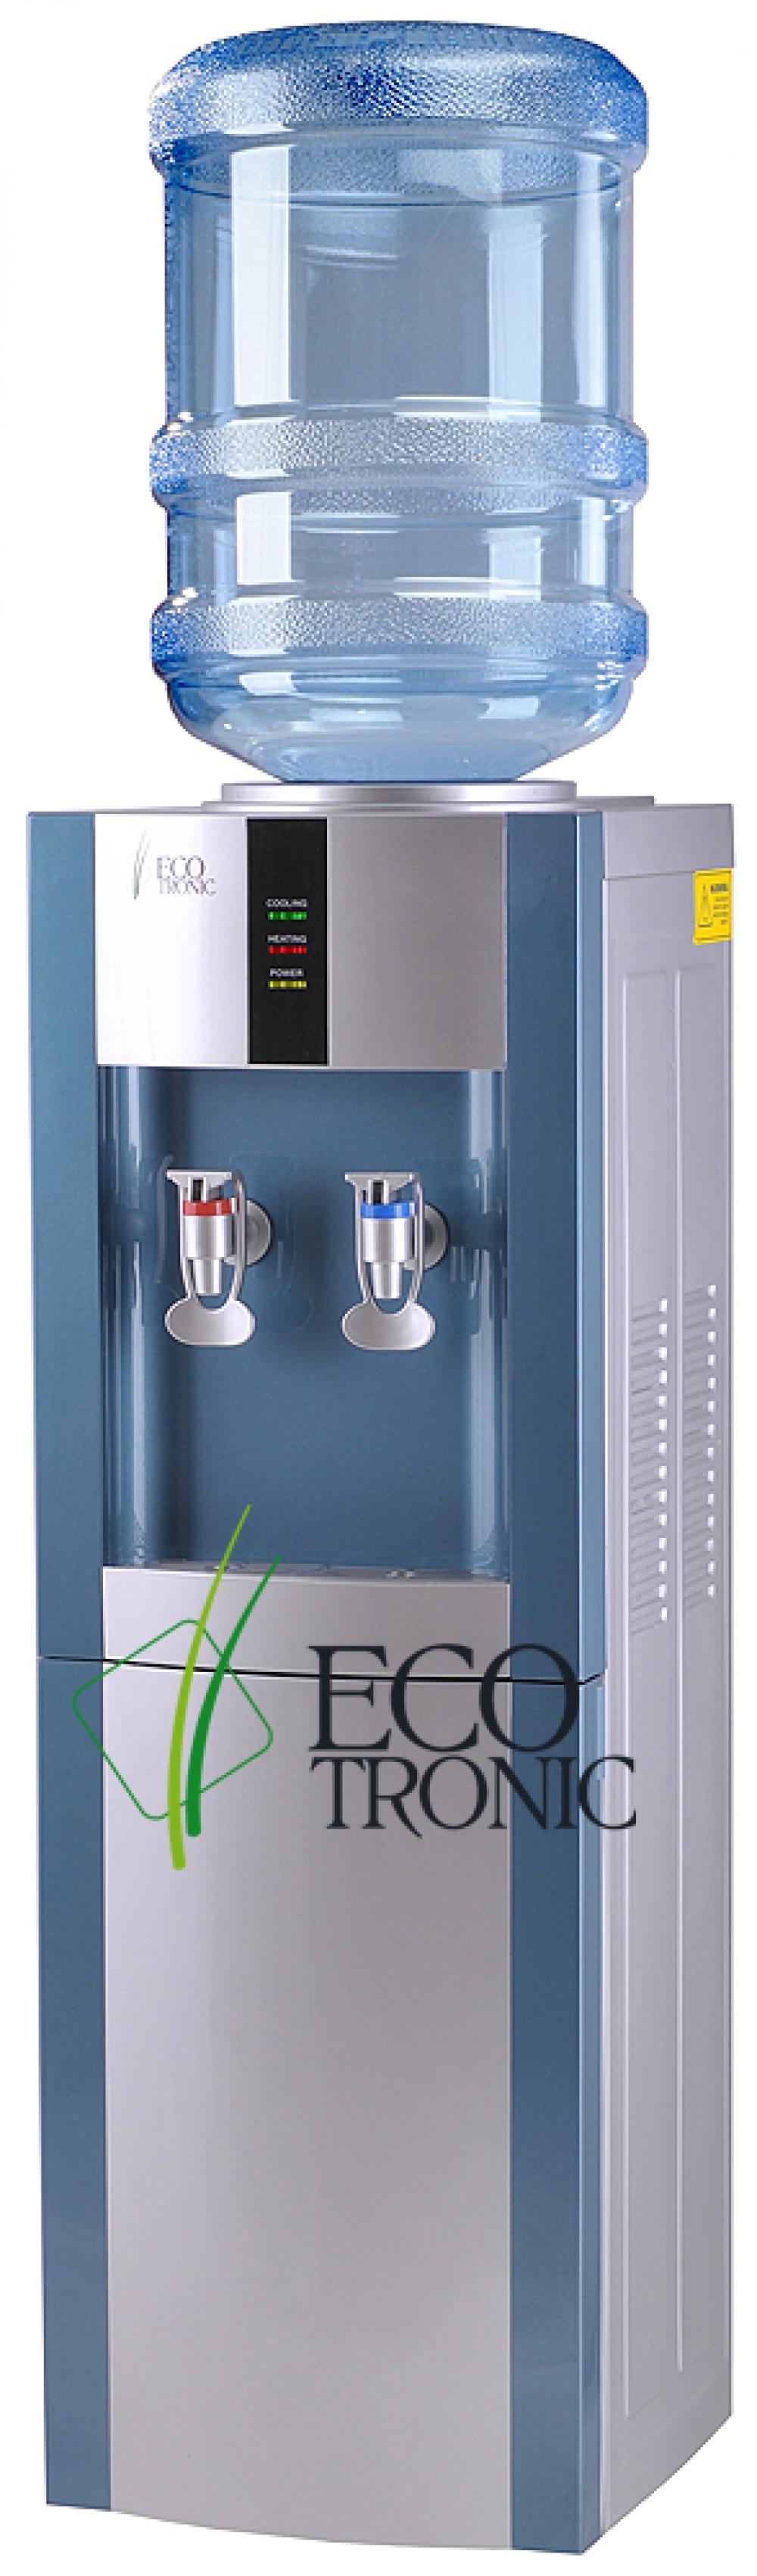 Ecotronic H1-LE с эл. охлаждением